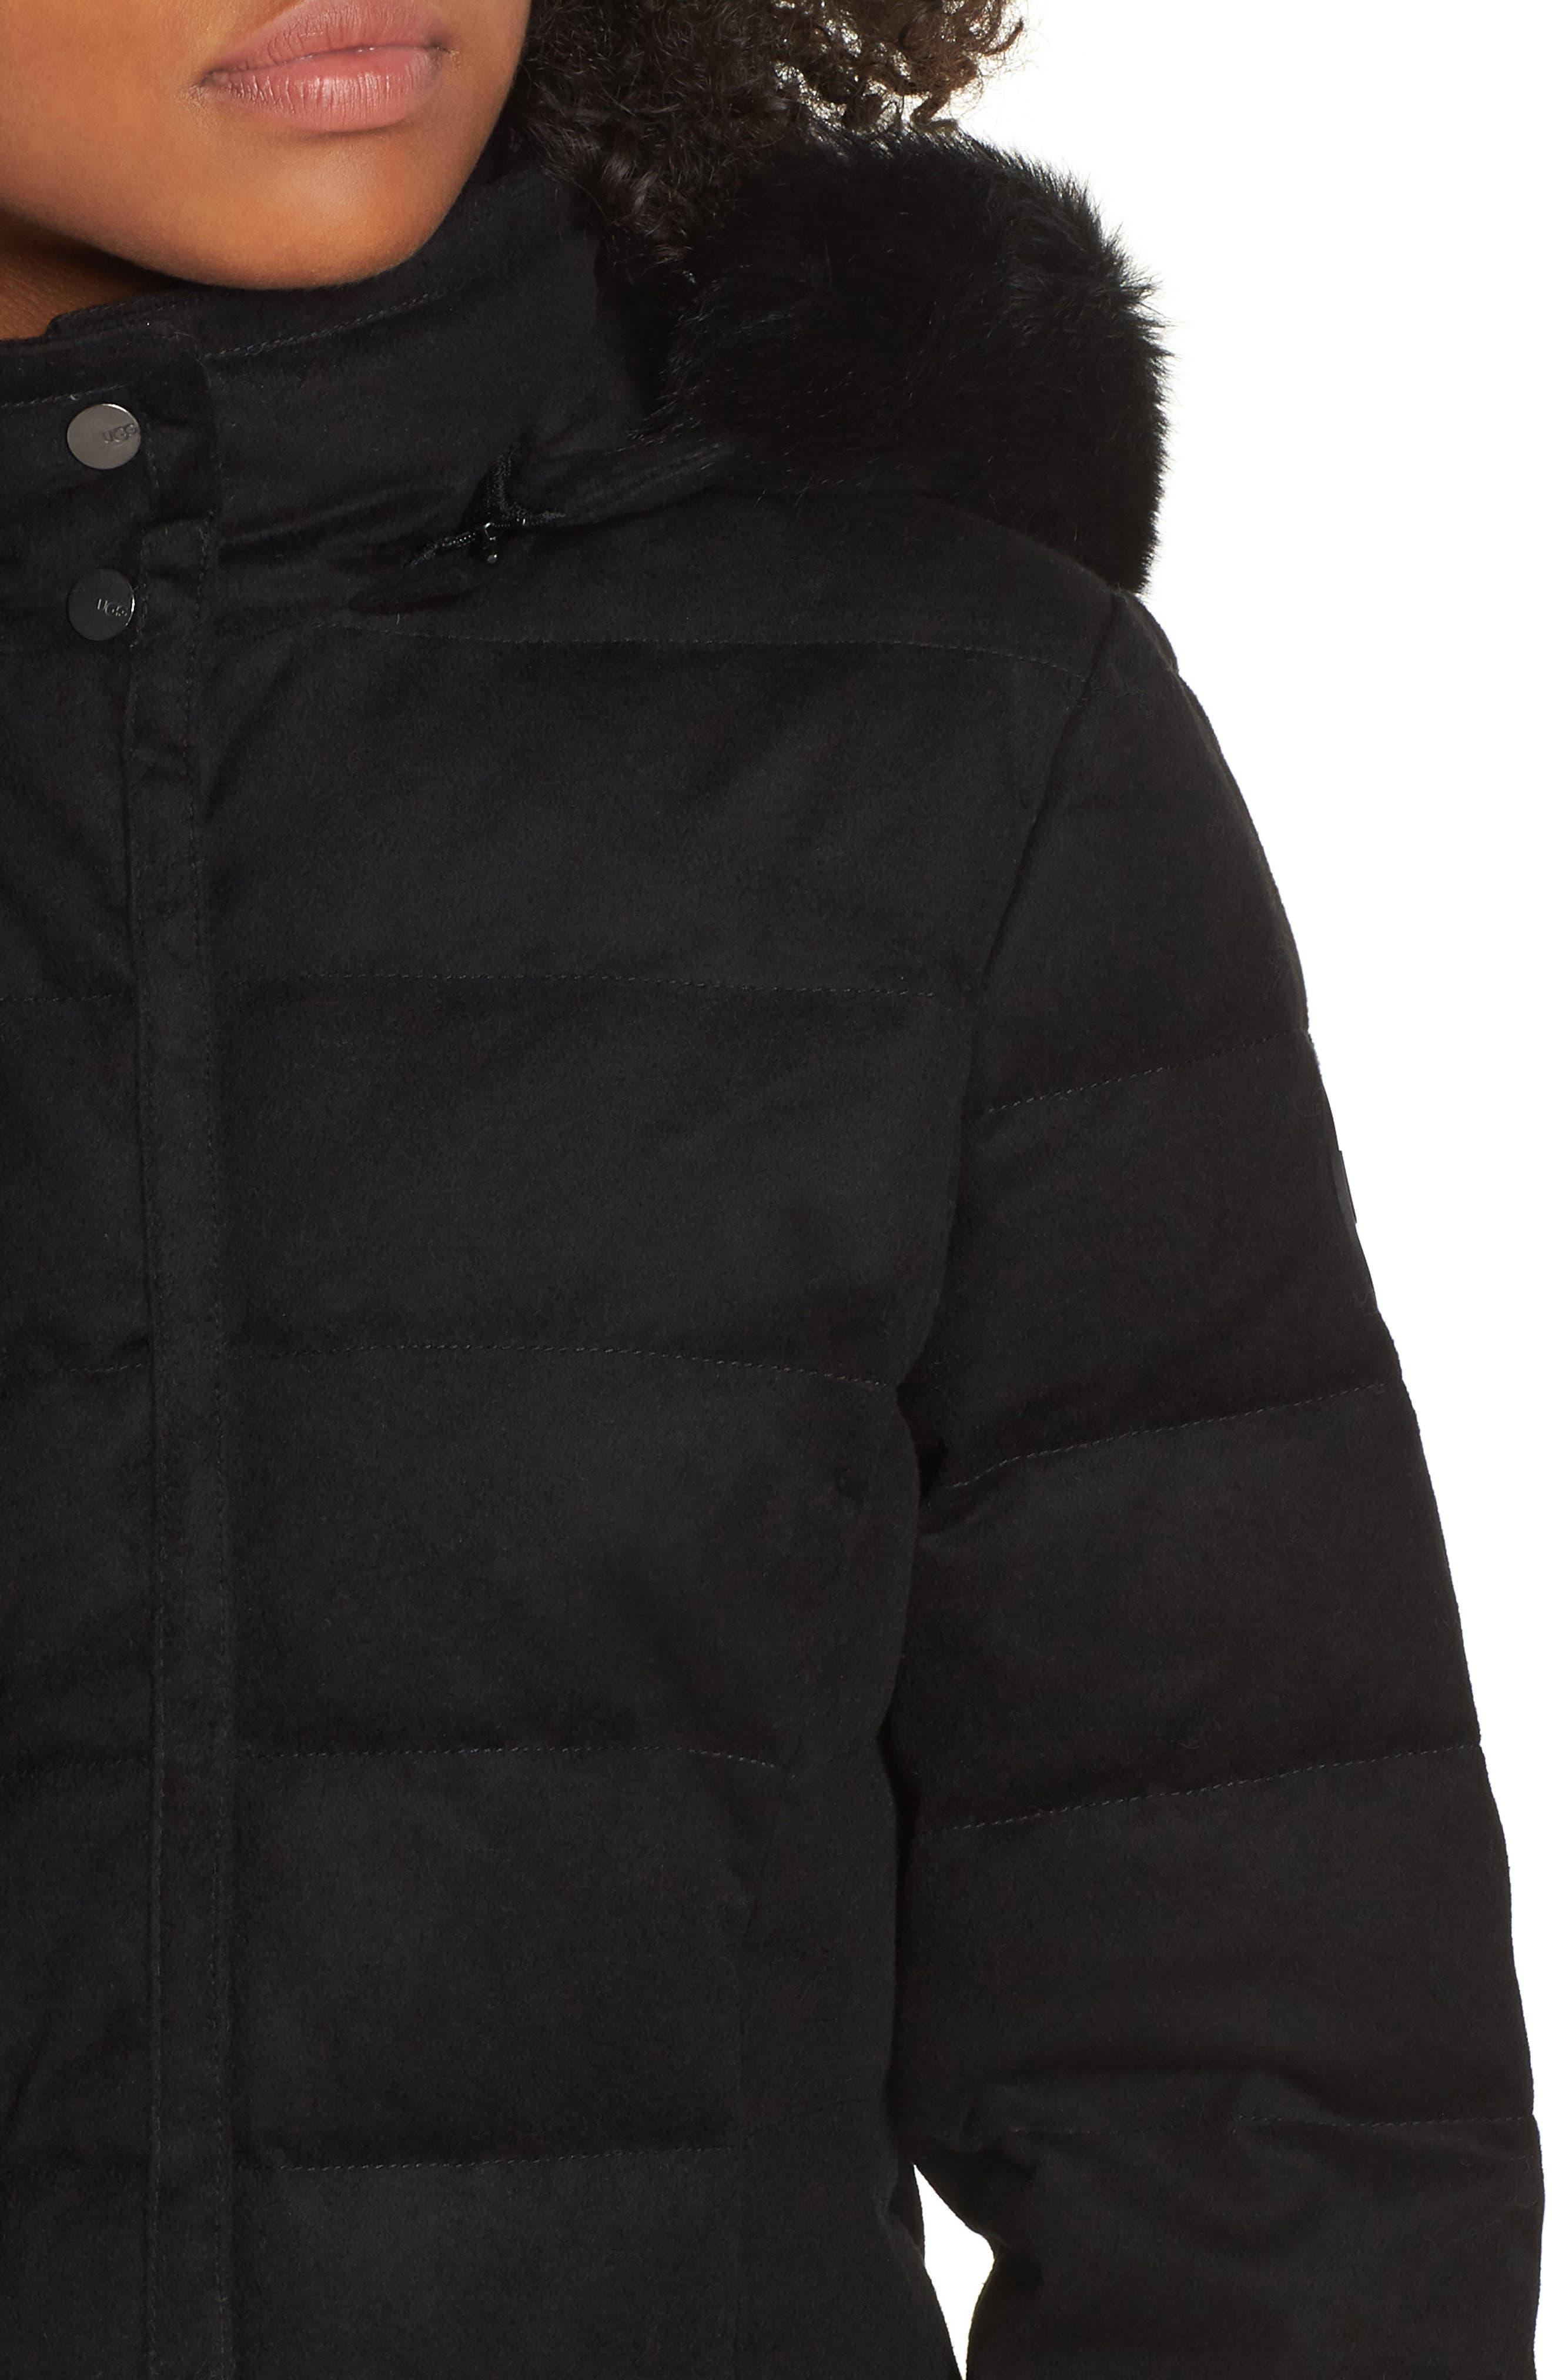 Celeste Genuine Shearling Trim Down Coat,                             Alternate thumbnail 4, color,                             BLACK